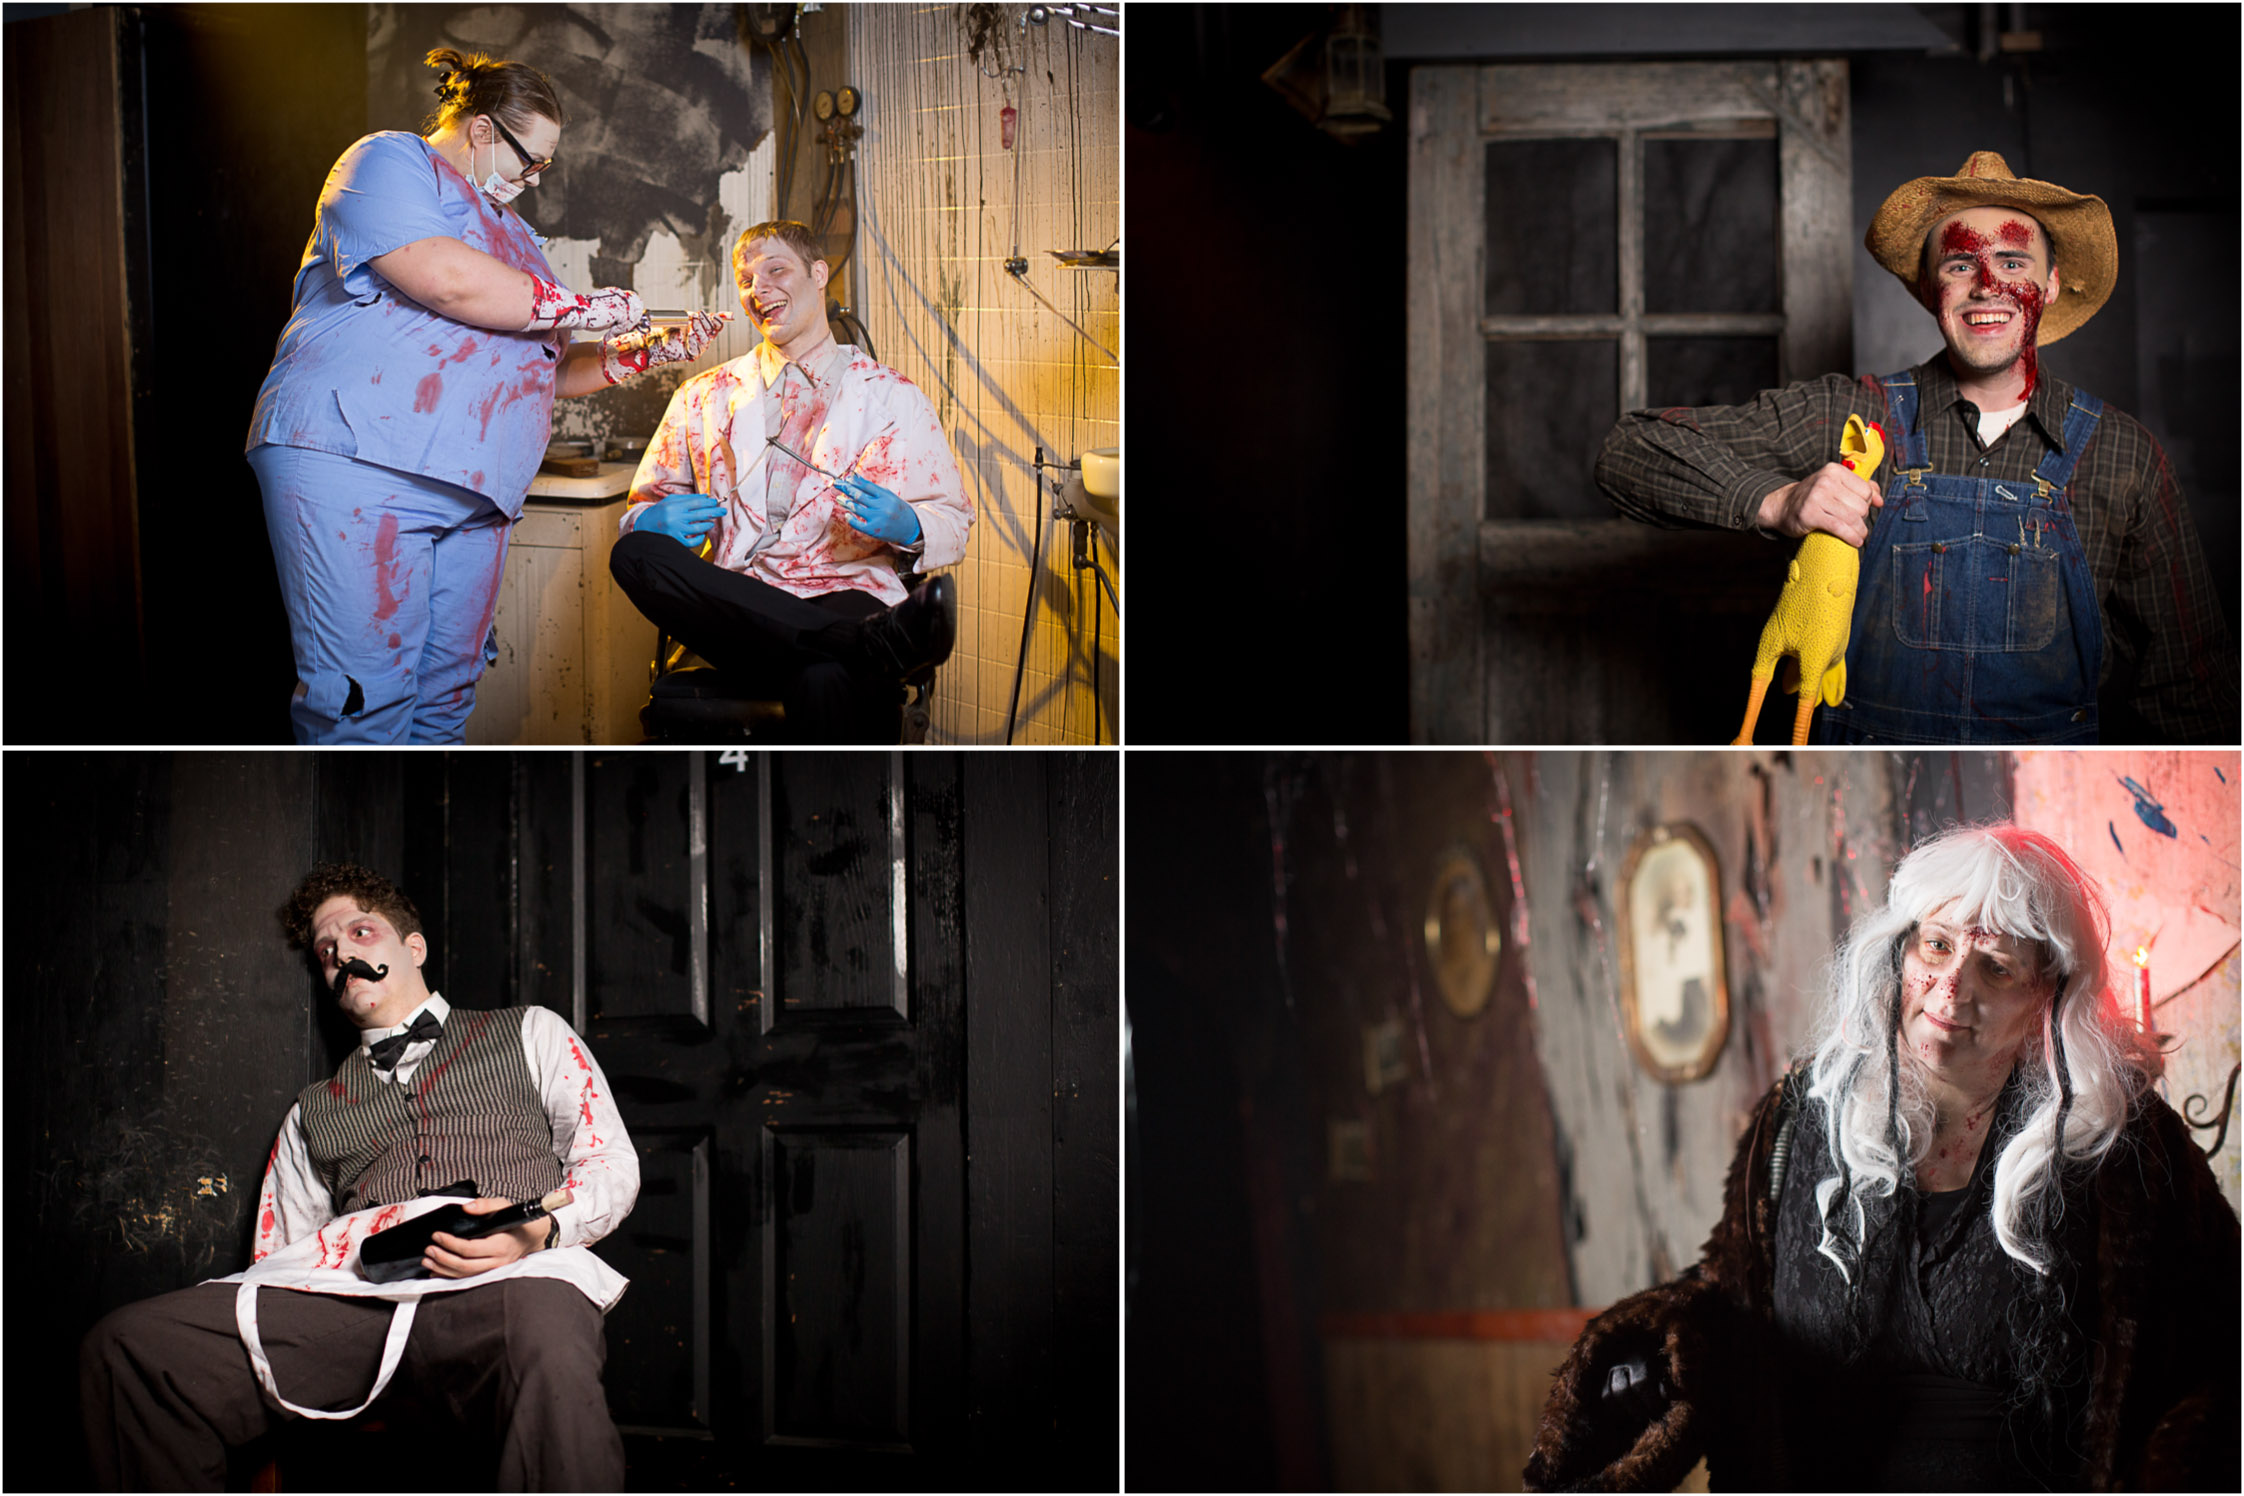 11-ramsey-county-fright-farm-haunted-house-minnesota-halloween-mahonen-photography.jpg